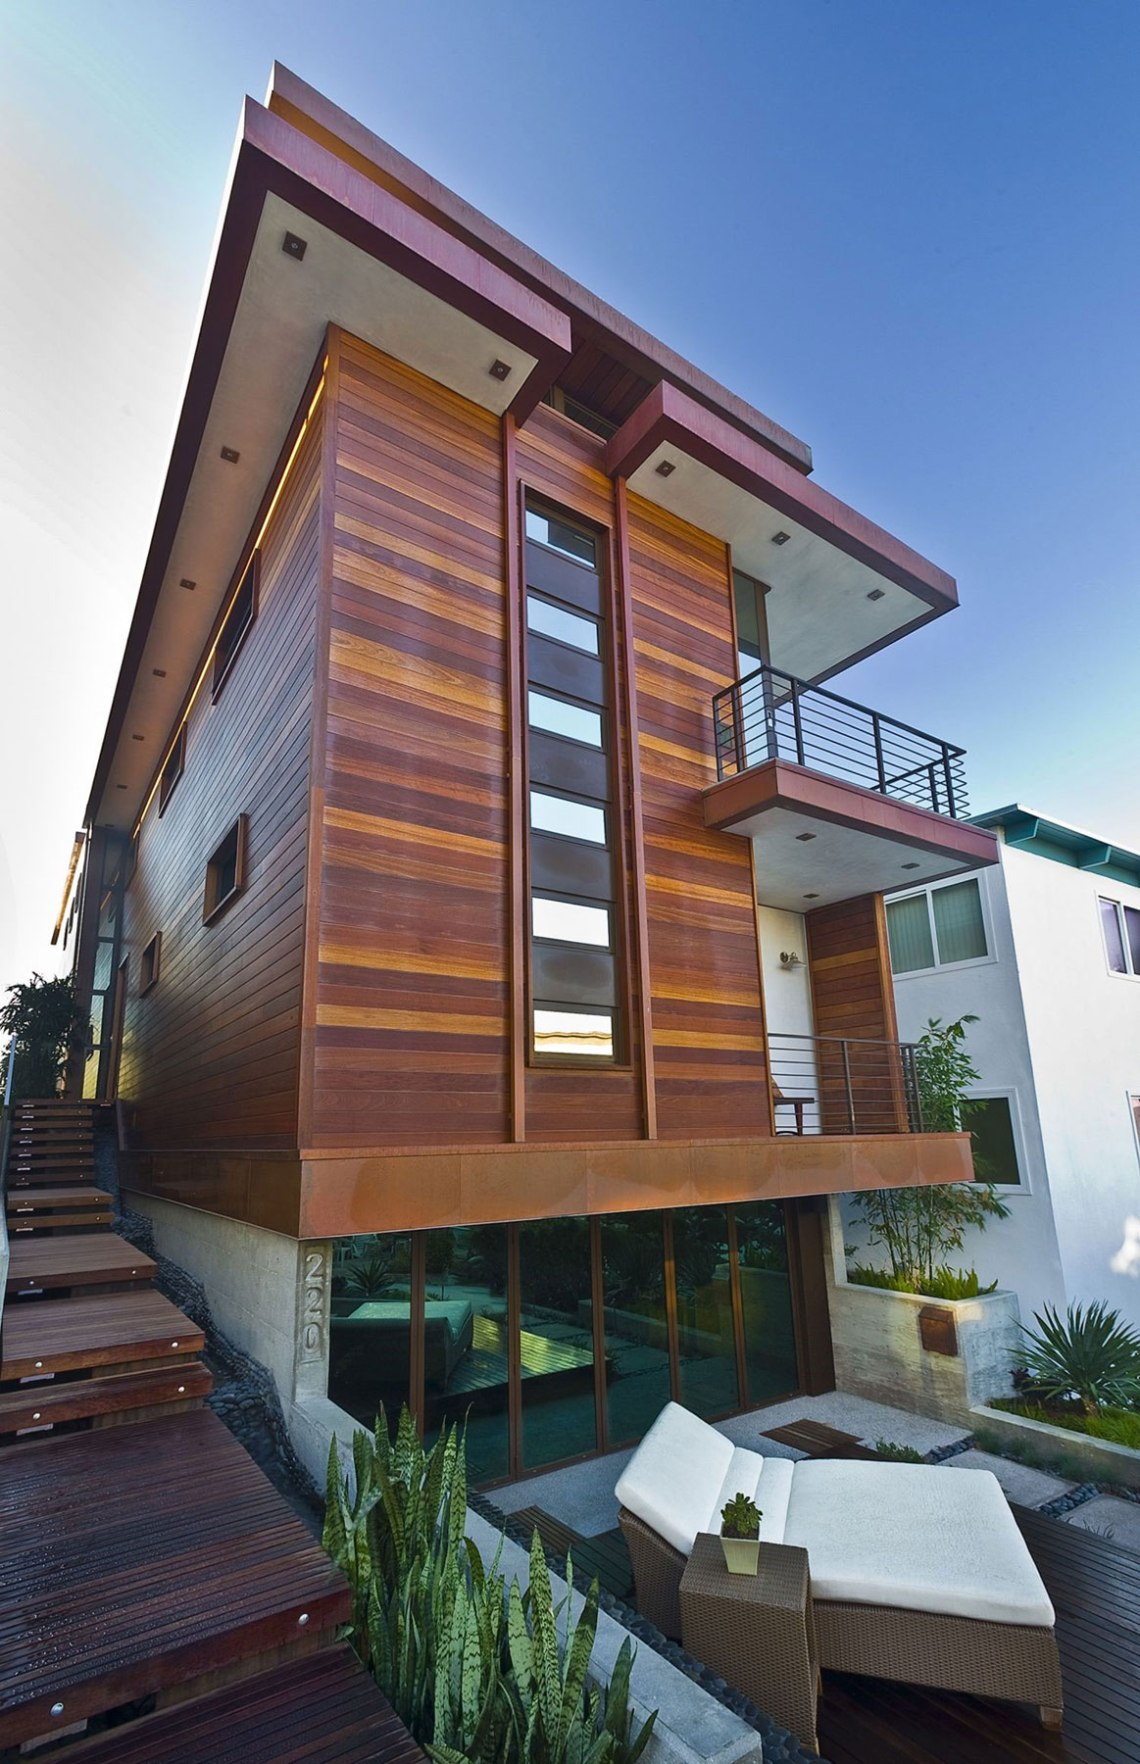 25 Contemporary Exterior Design Ideas - Decoration Love